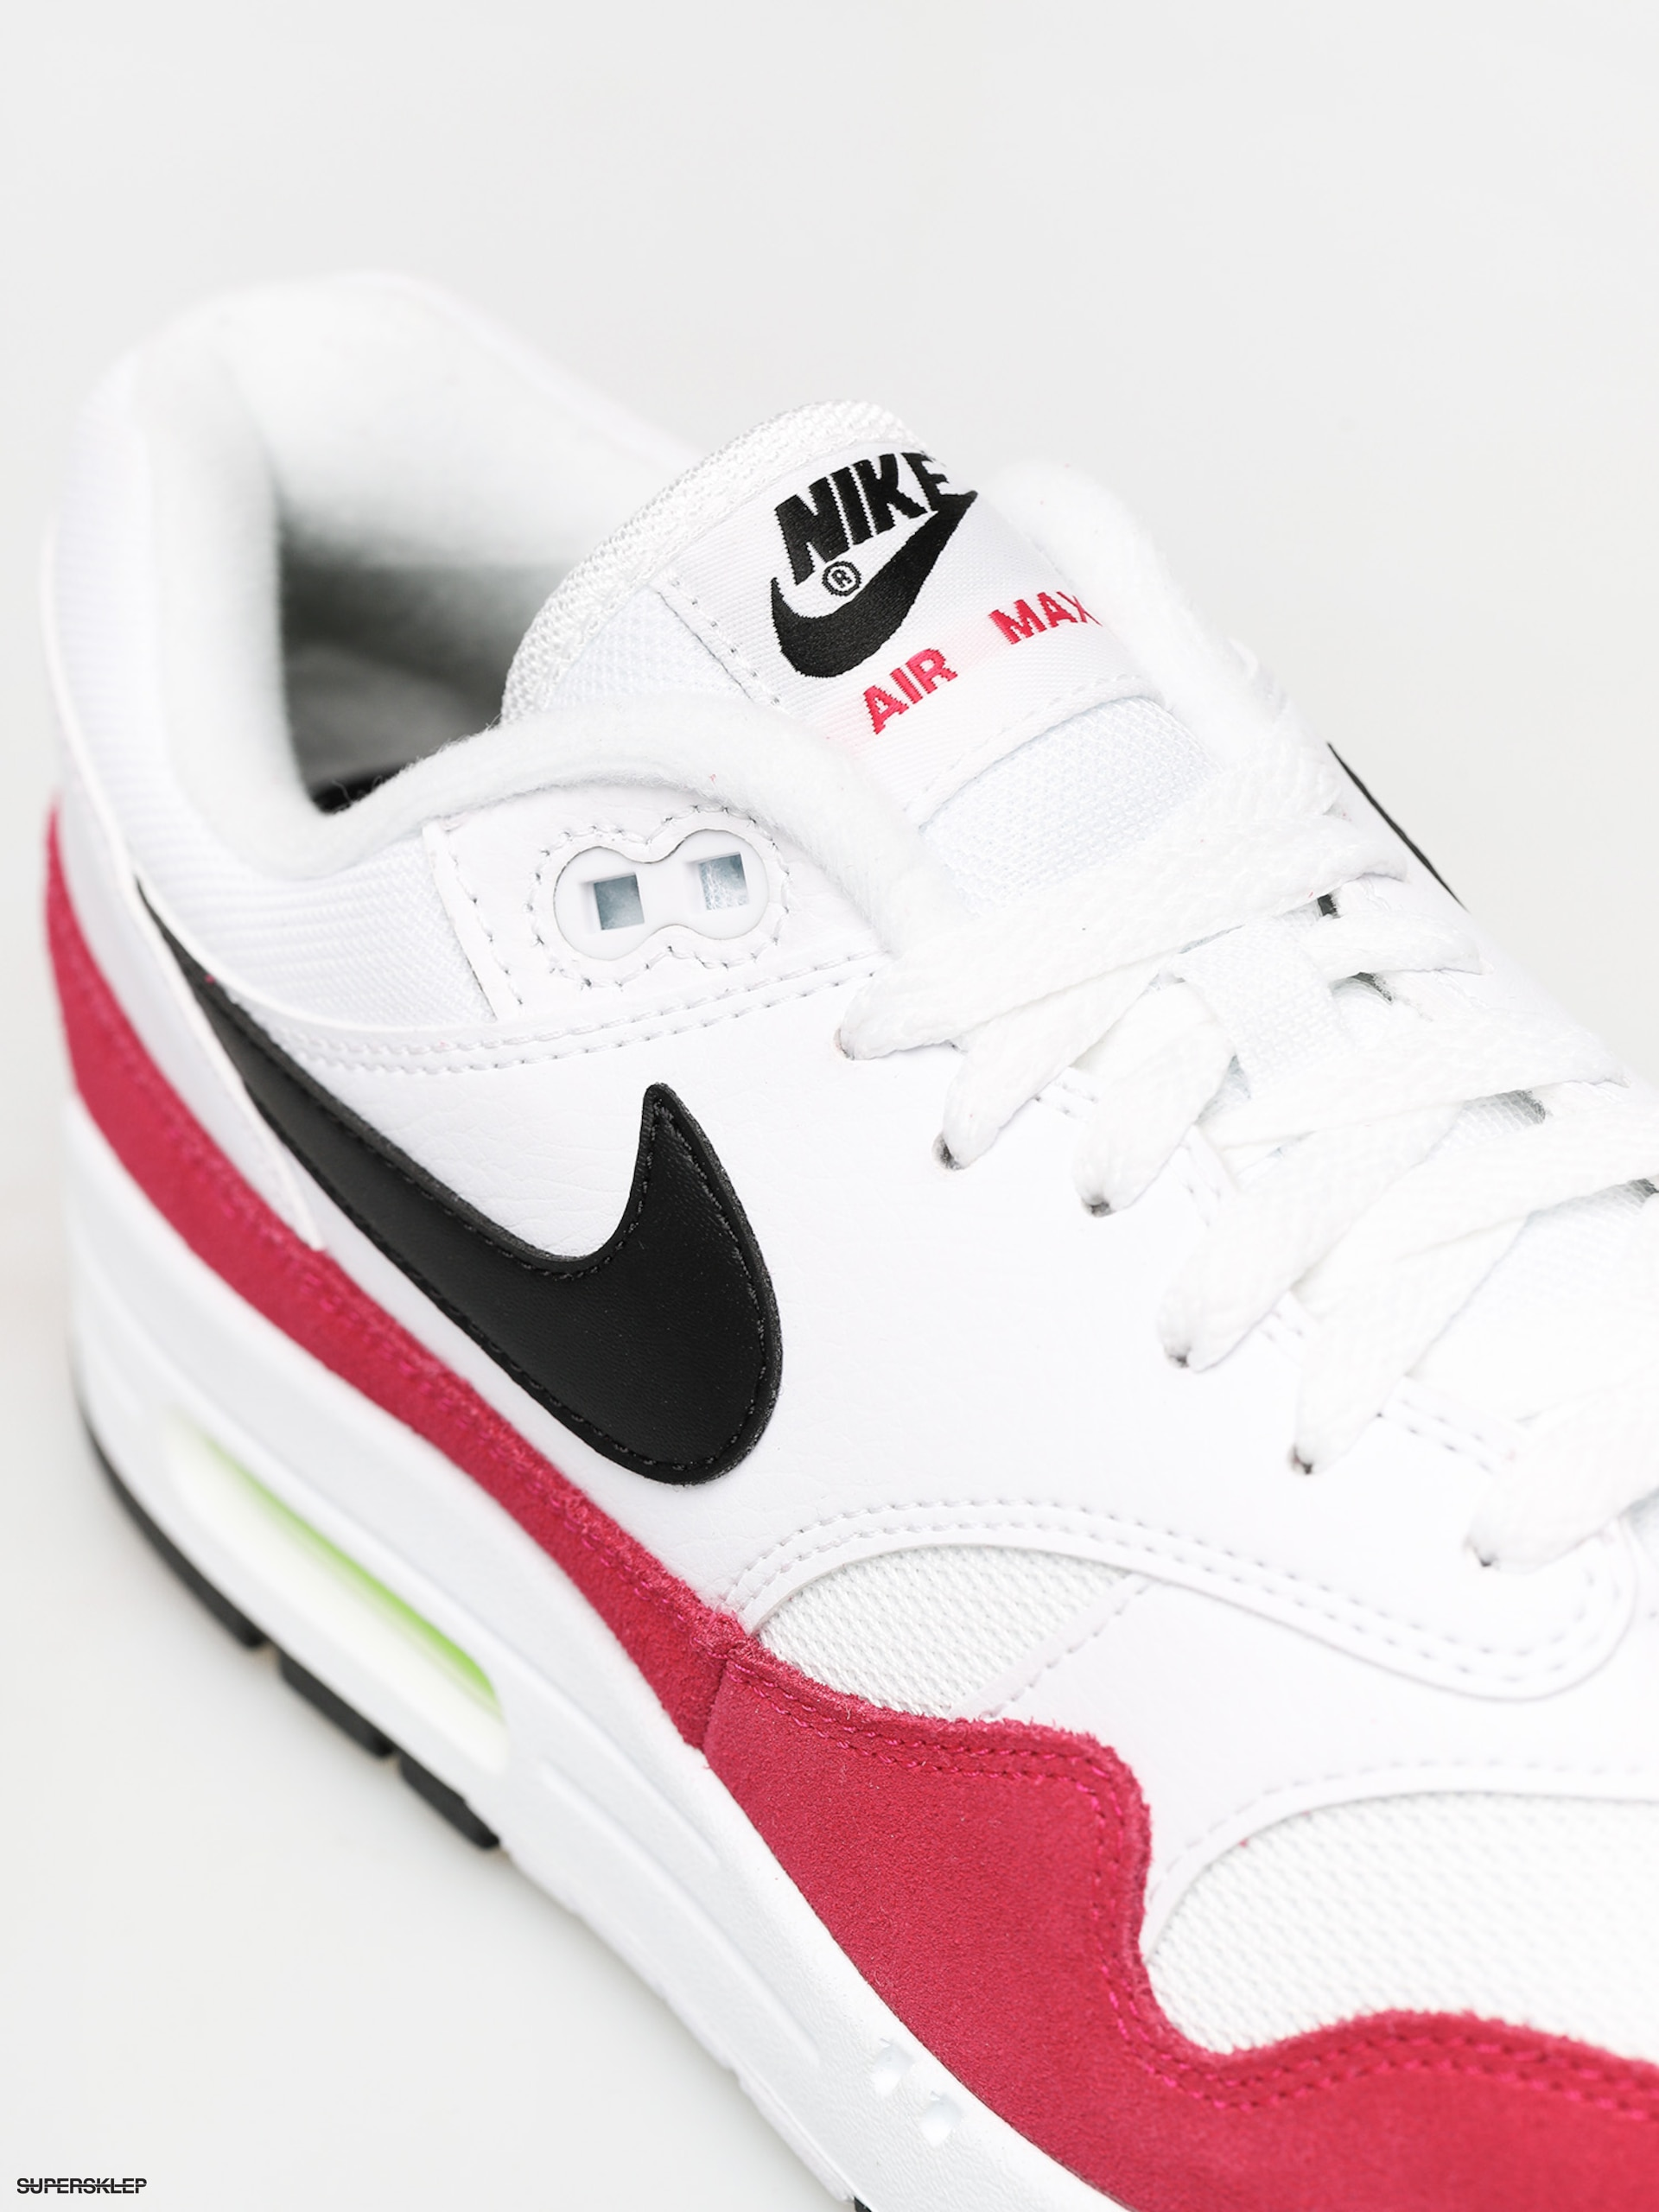 Damskie Nike Air Max 97 w kolorystyce BlackVolt